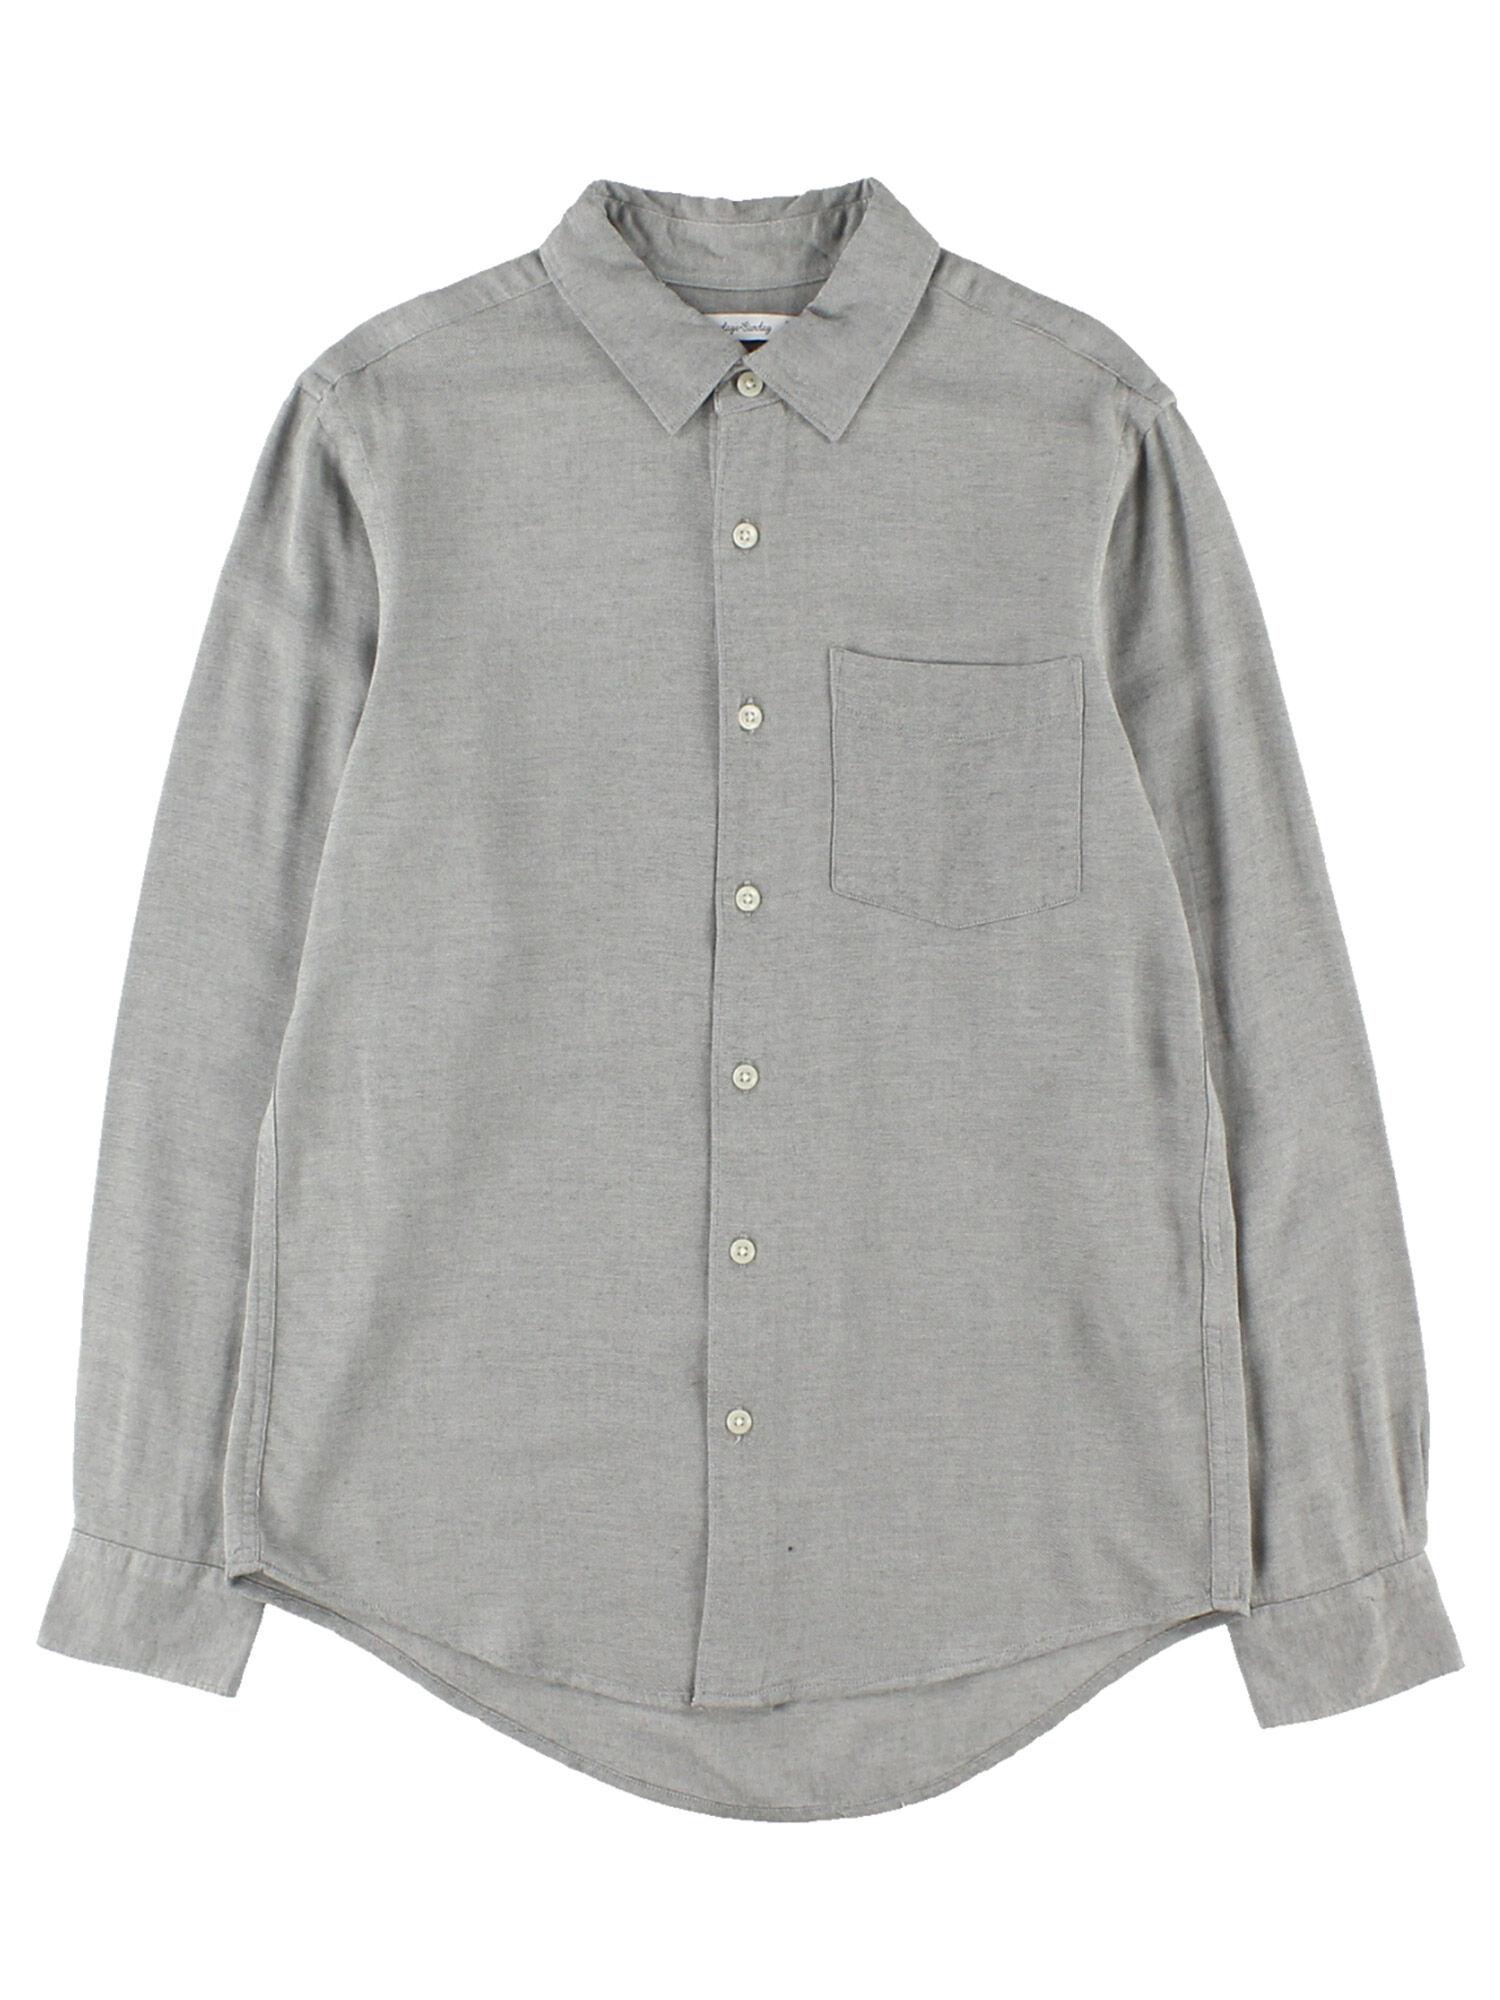 Men'sTRピーチ長袖フレンチフロントシャツ